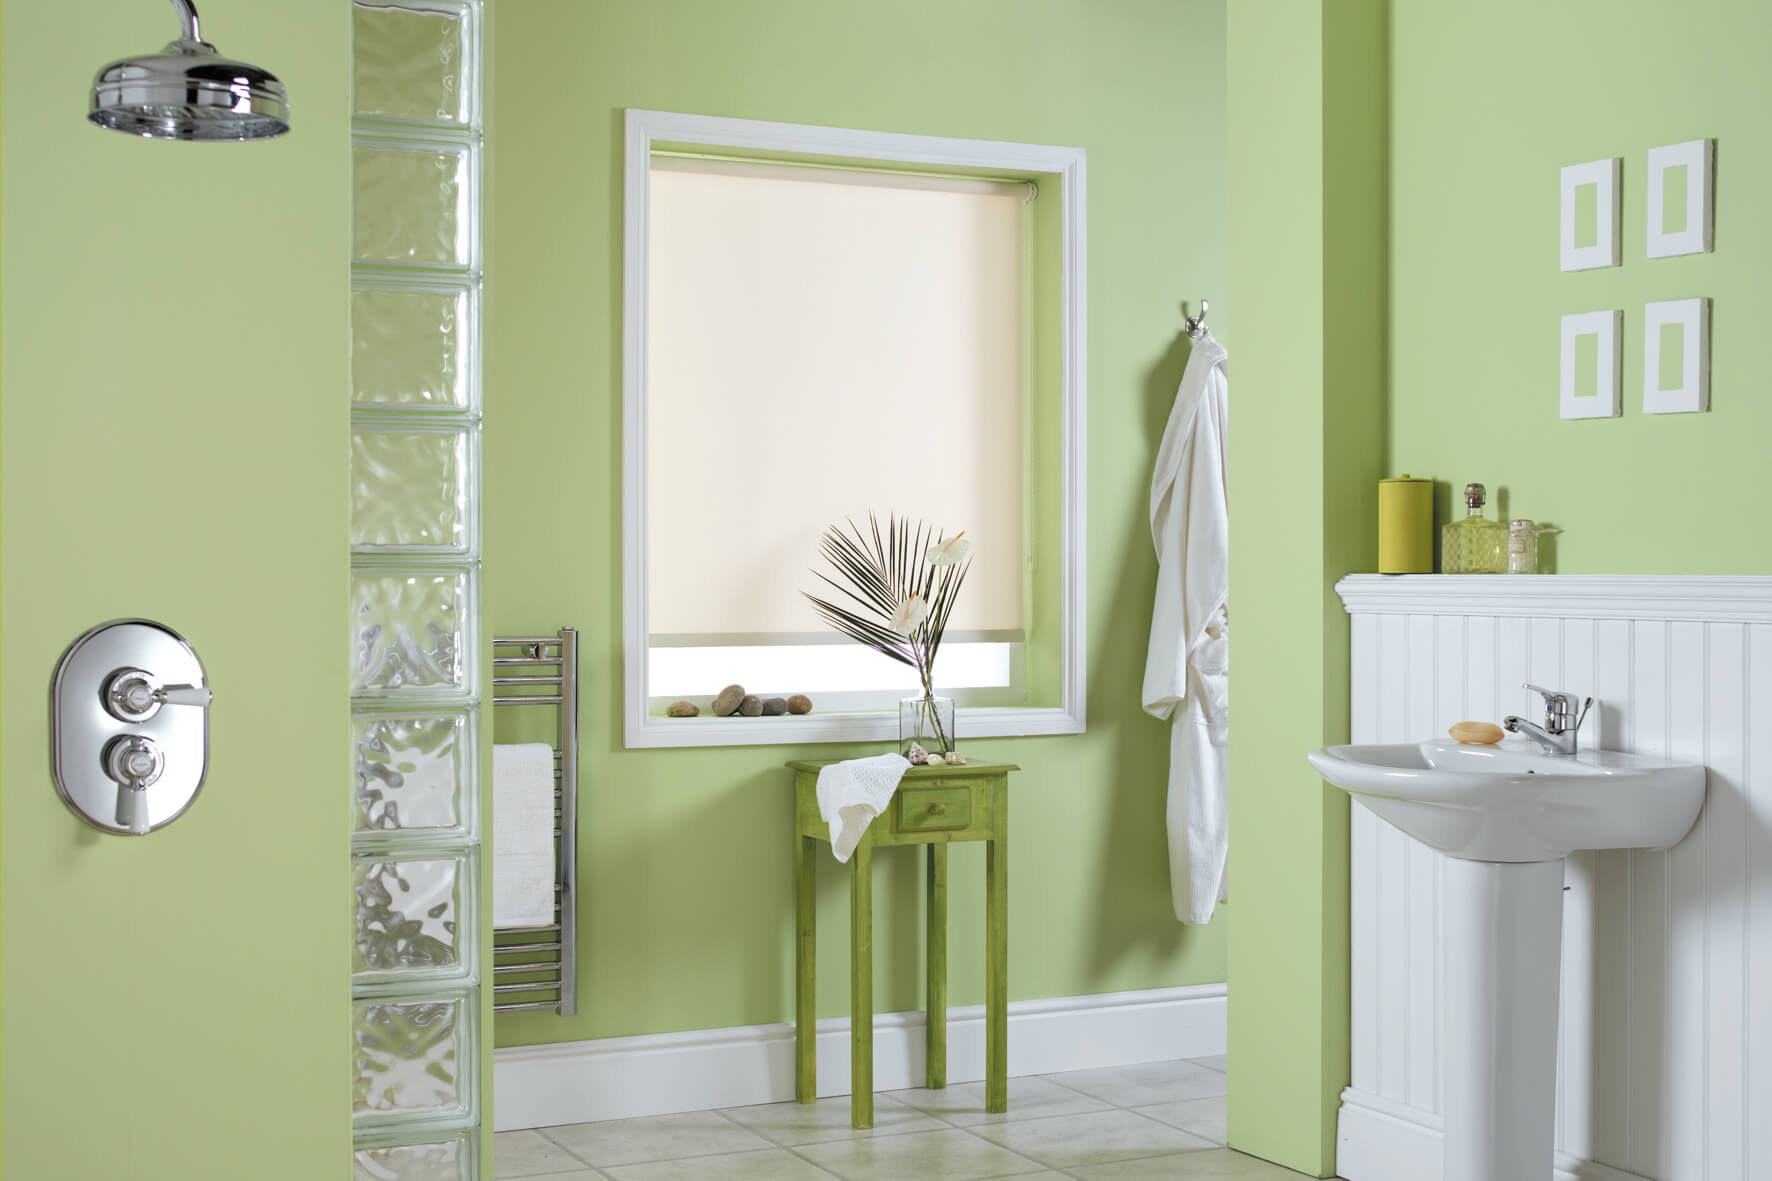 lowes bathroom tile for walls - mauorel